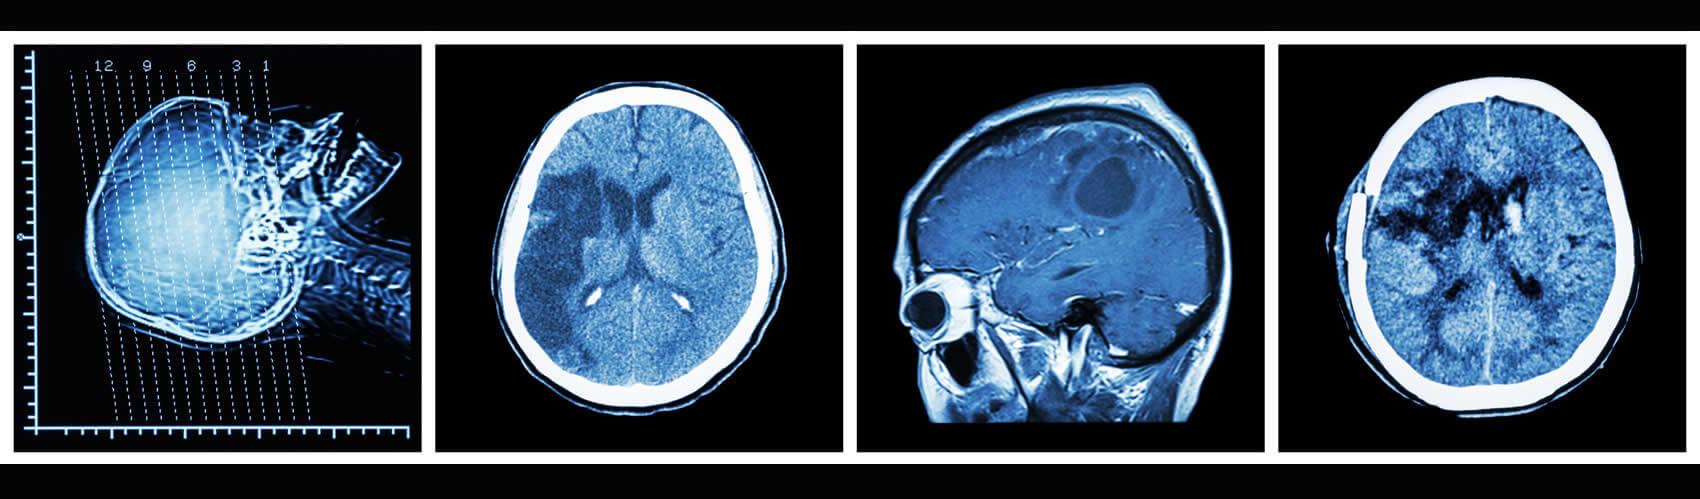 Radiologie Hoheluft Neurologie